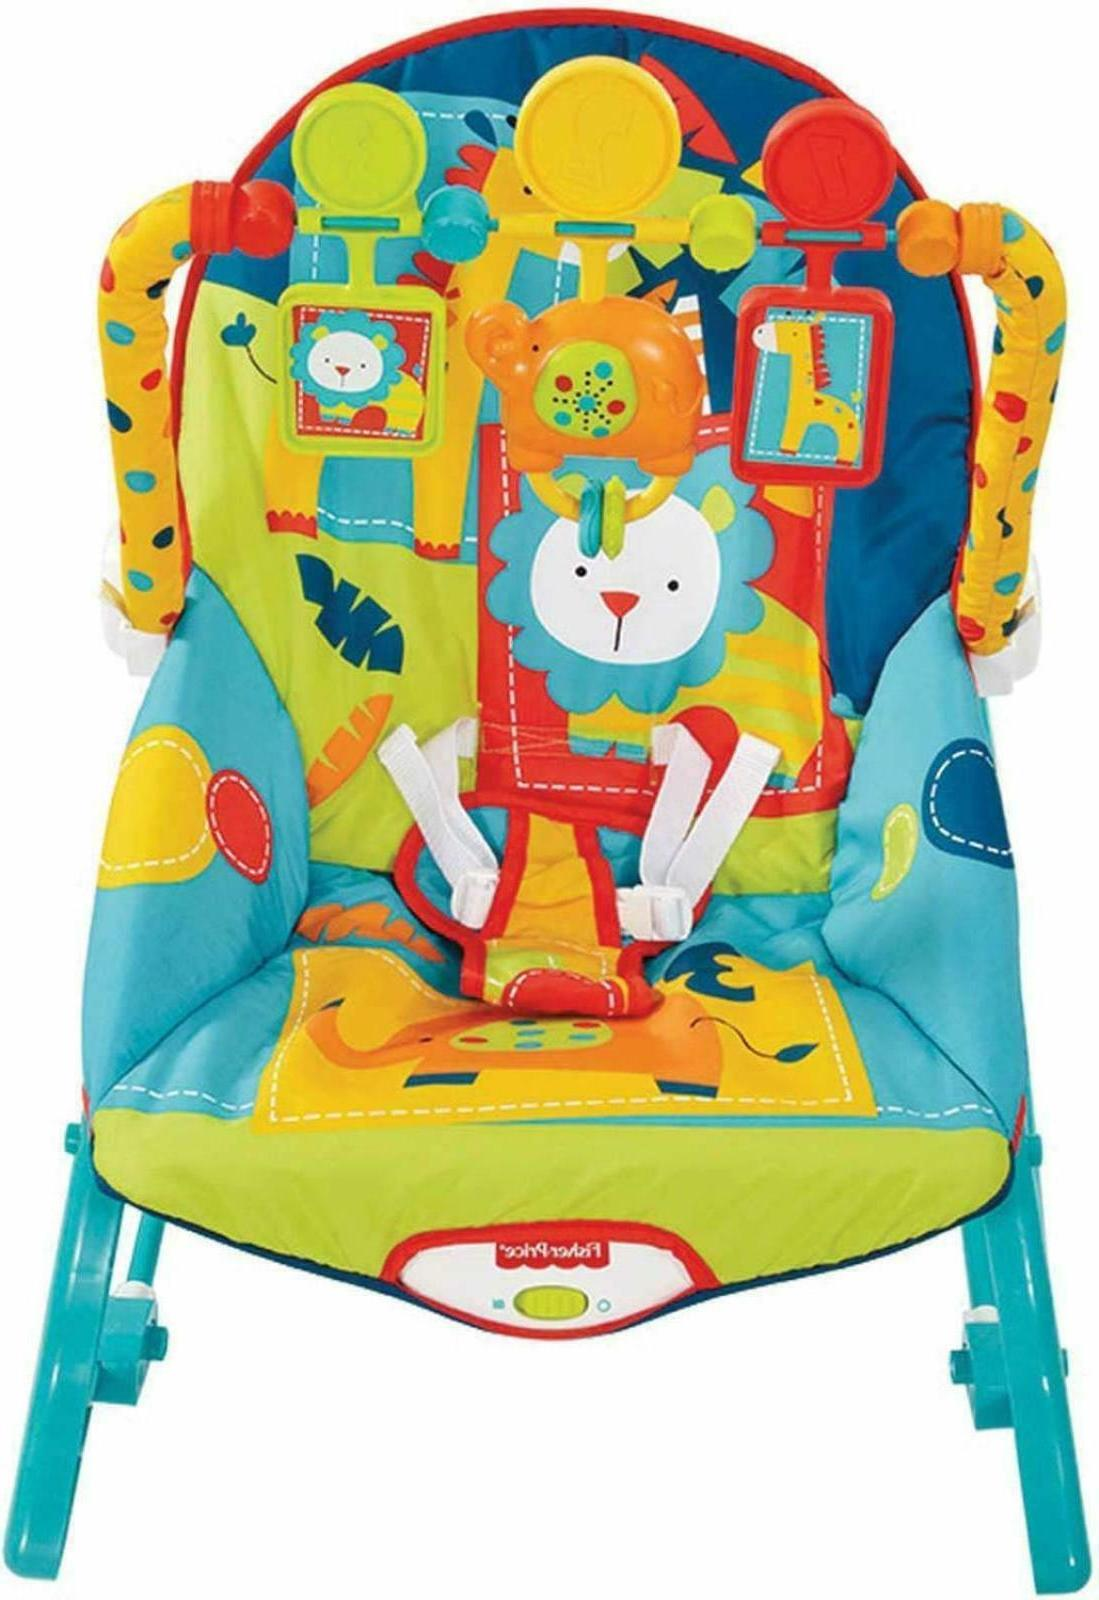 Baby Rocker Chair Infant Rocking Bunting Swing